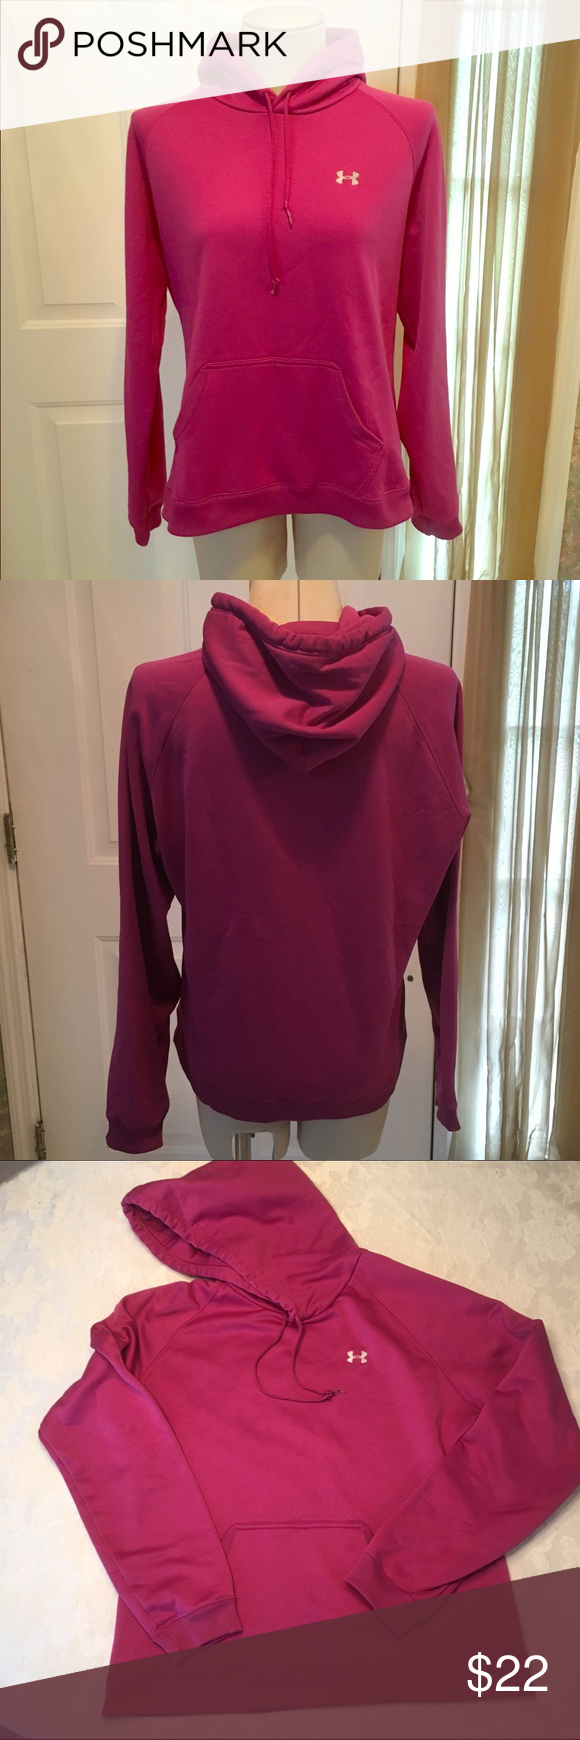 Hoodie sweatshirt Under Armour size large hoodie Under Armour Tops Sweatshirts & Hoodies